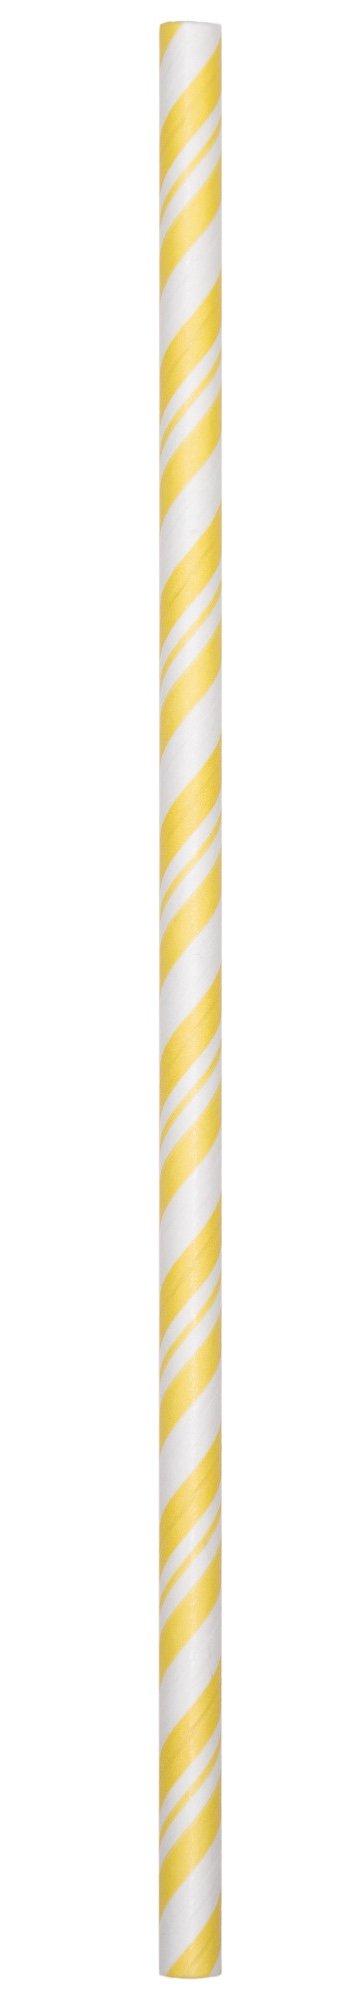 Creative Converting 24 Count Paper Straws, Mimosa Yellow/White Stripe